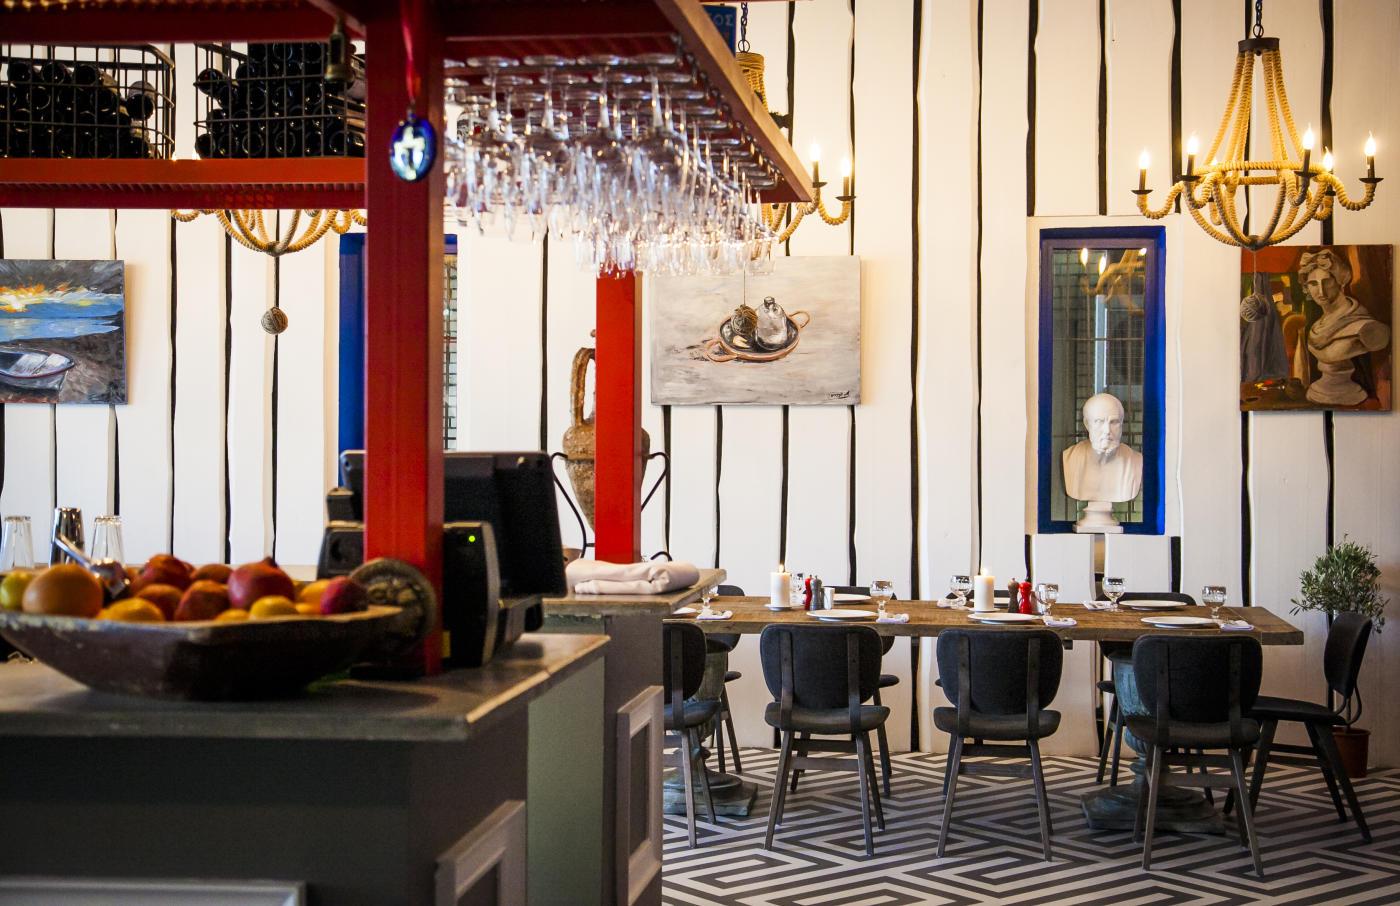 Греческий Ресторан Molon Lave (Молон Лаве) фото 13